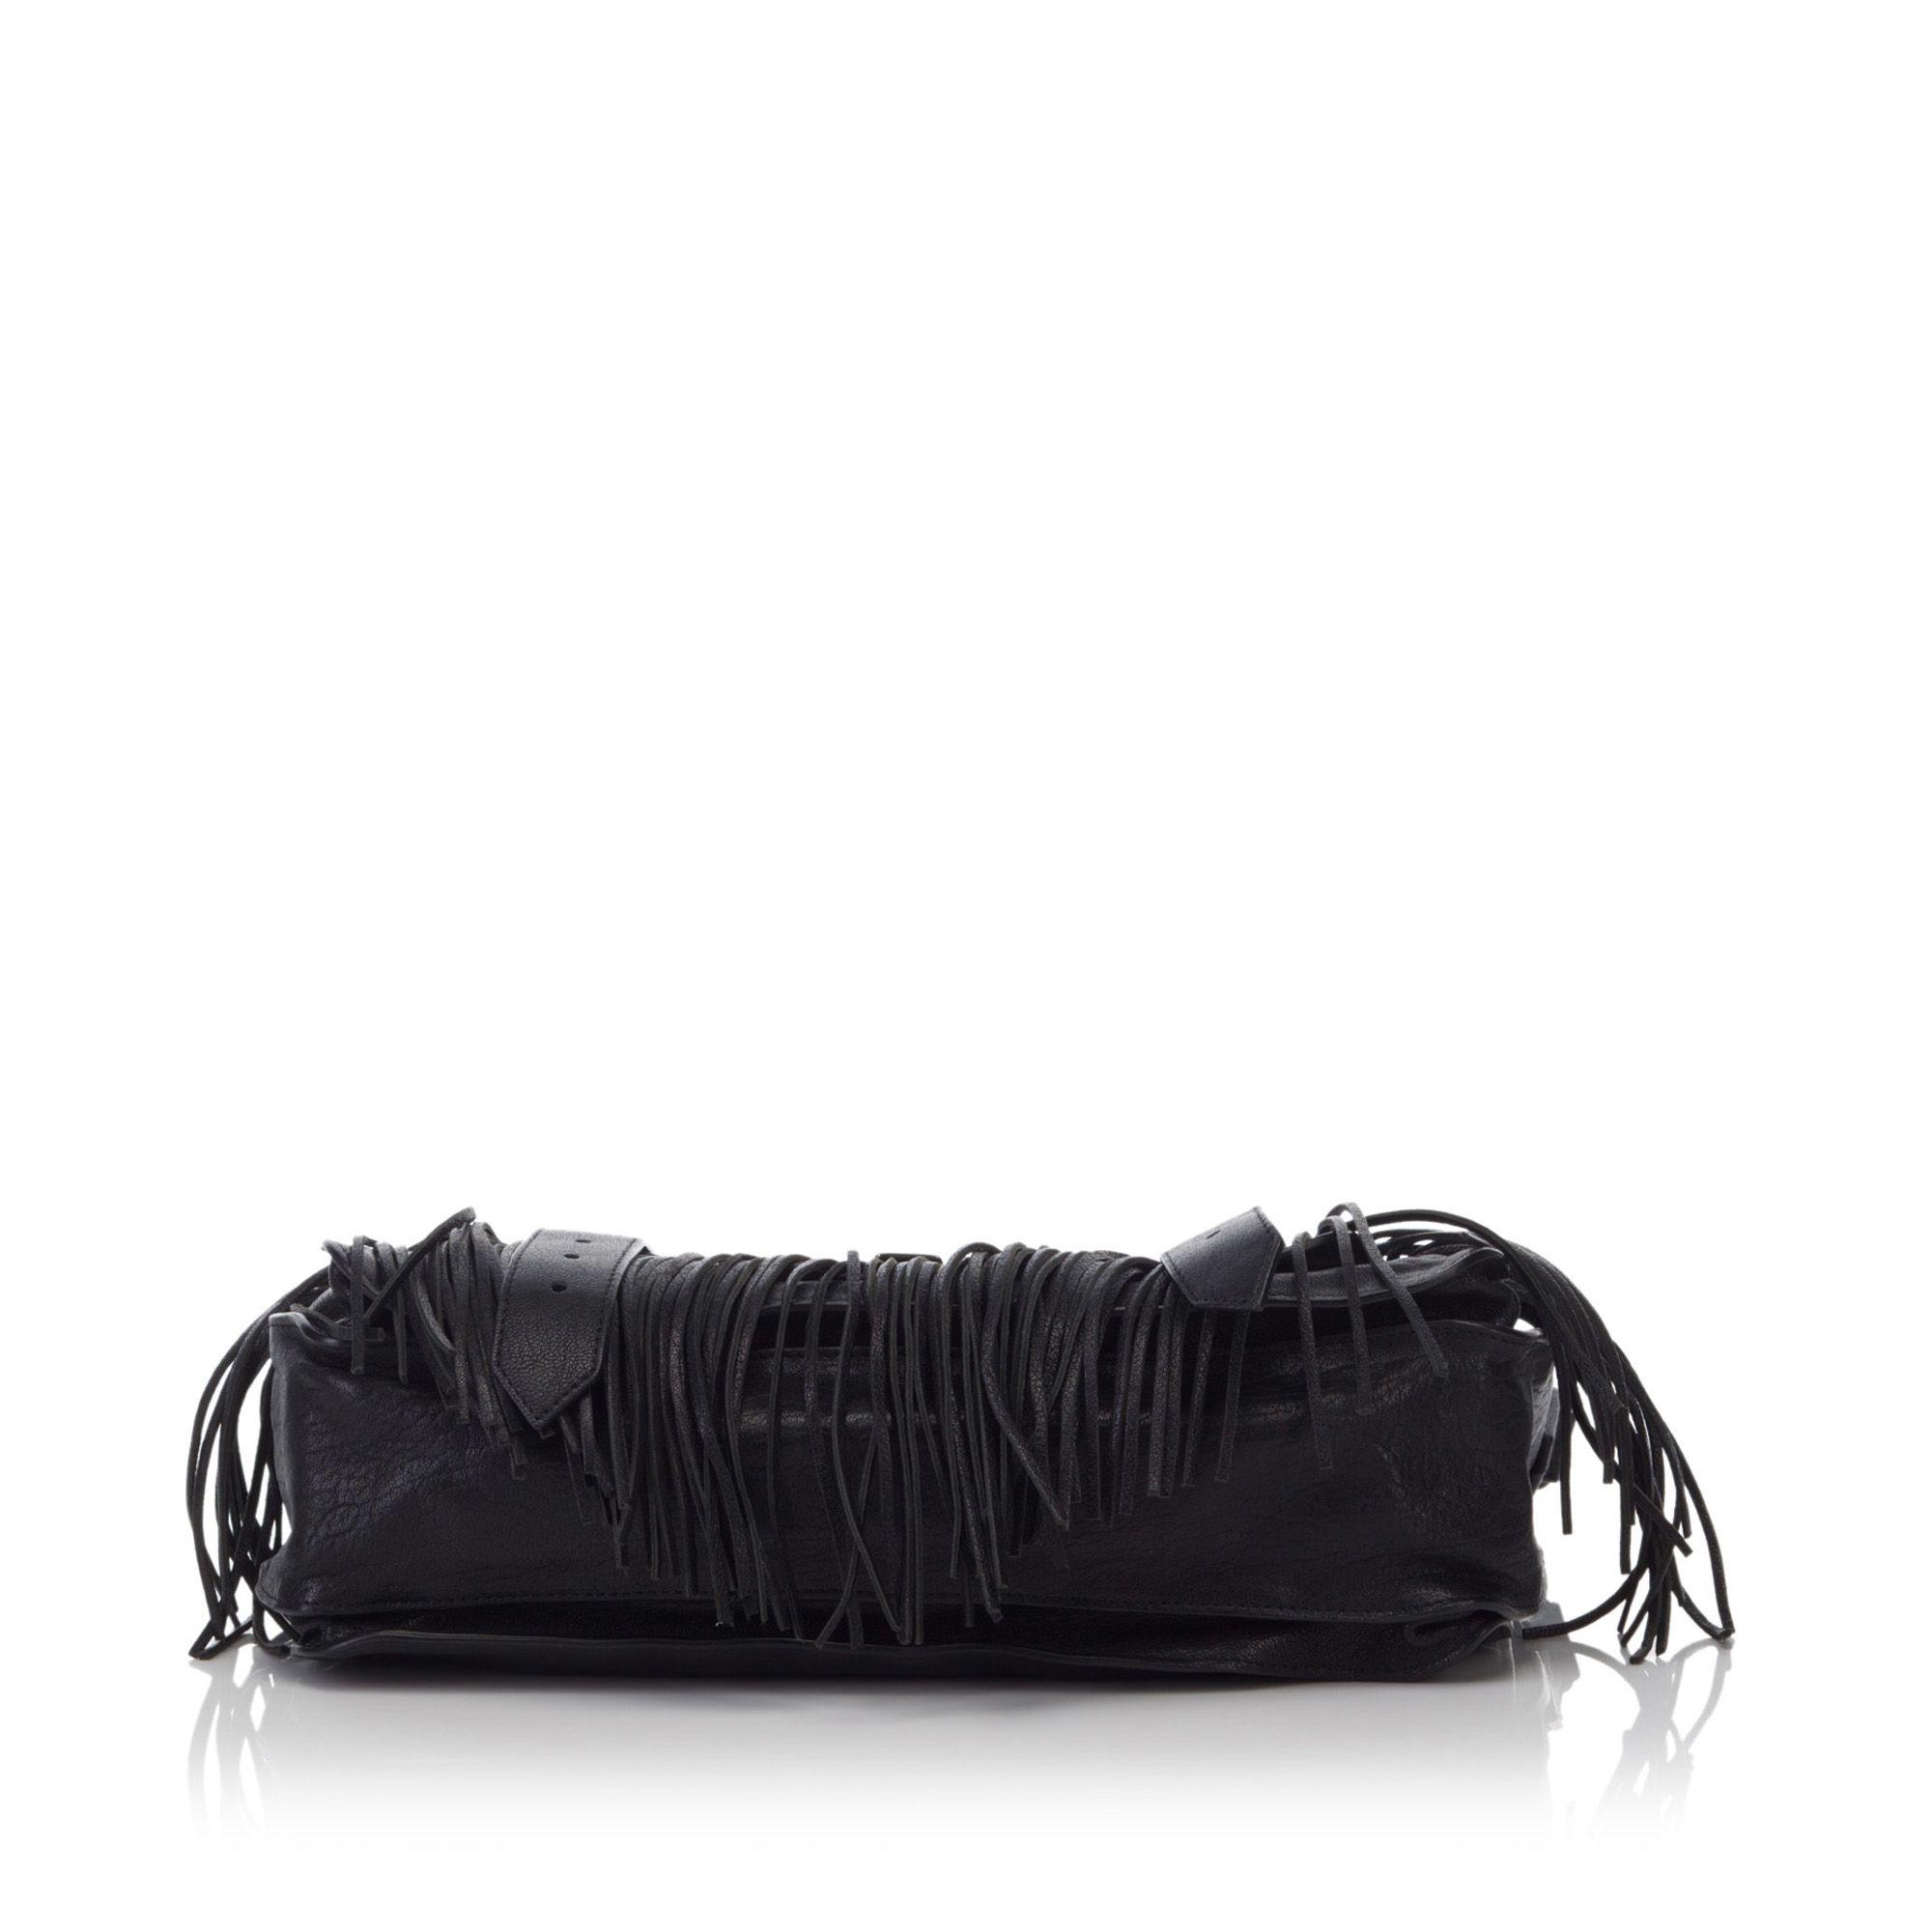 Proenza Schouler Leather Fringe PS1 Black